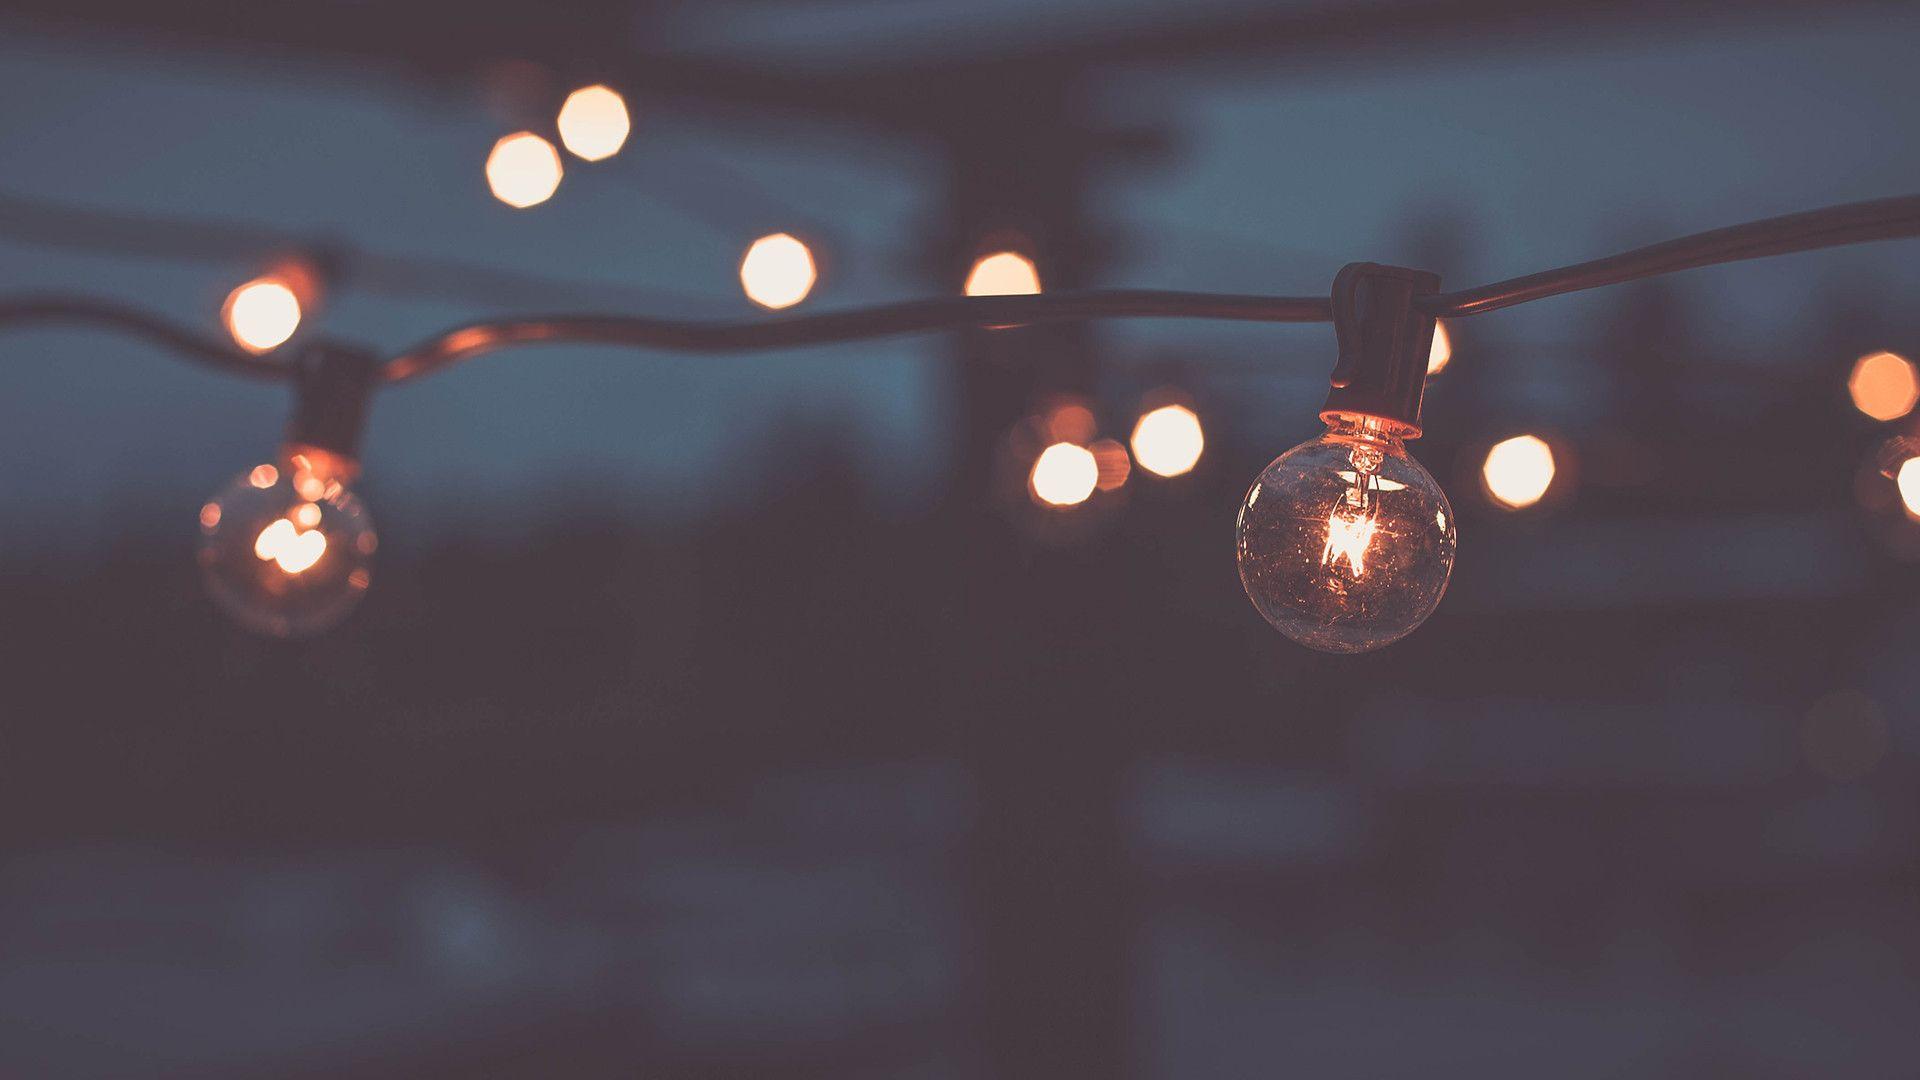 String Lights Bokeh : HD. 1920x1080. Lightbulbs on a string. Ambience, Lights & Bokeh Wallpaper Pinterest ...